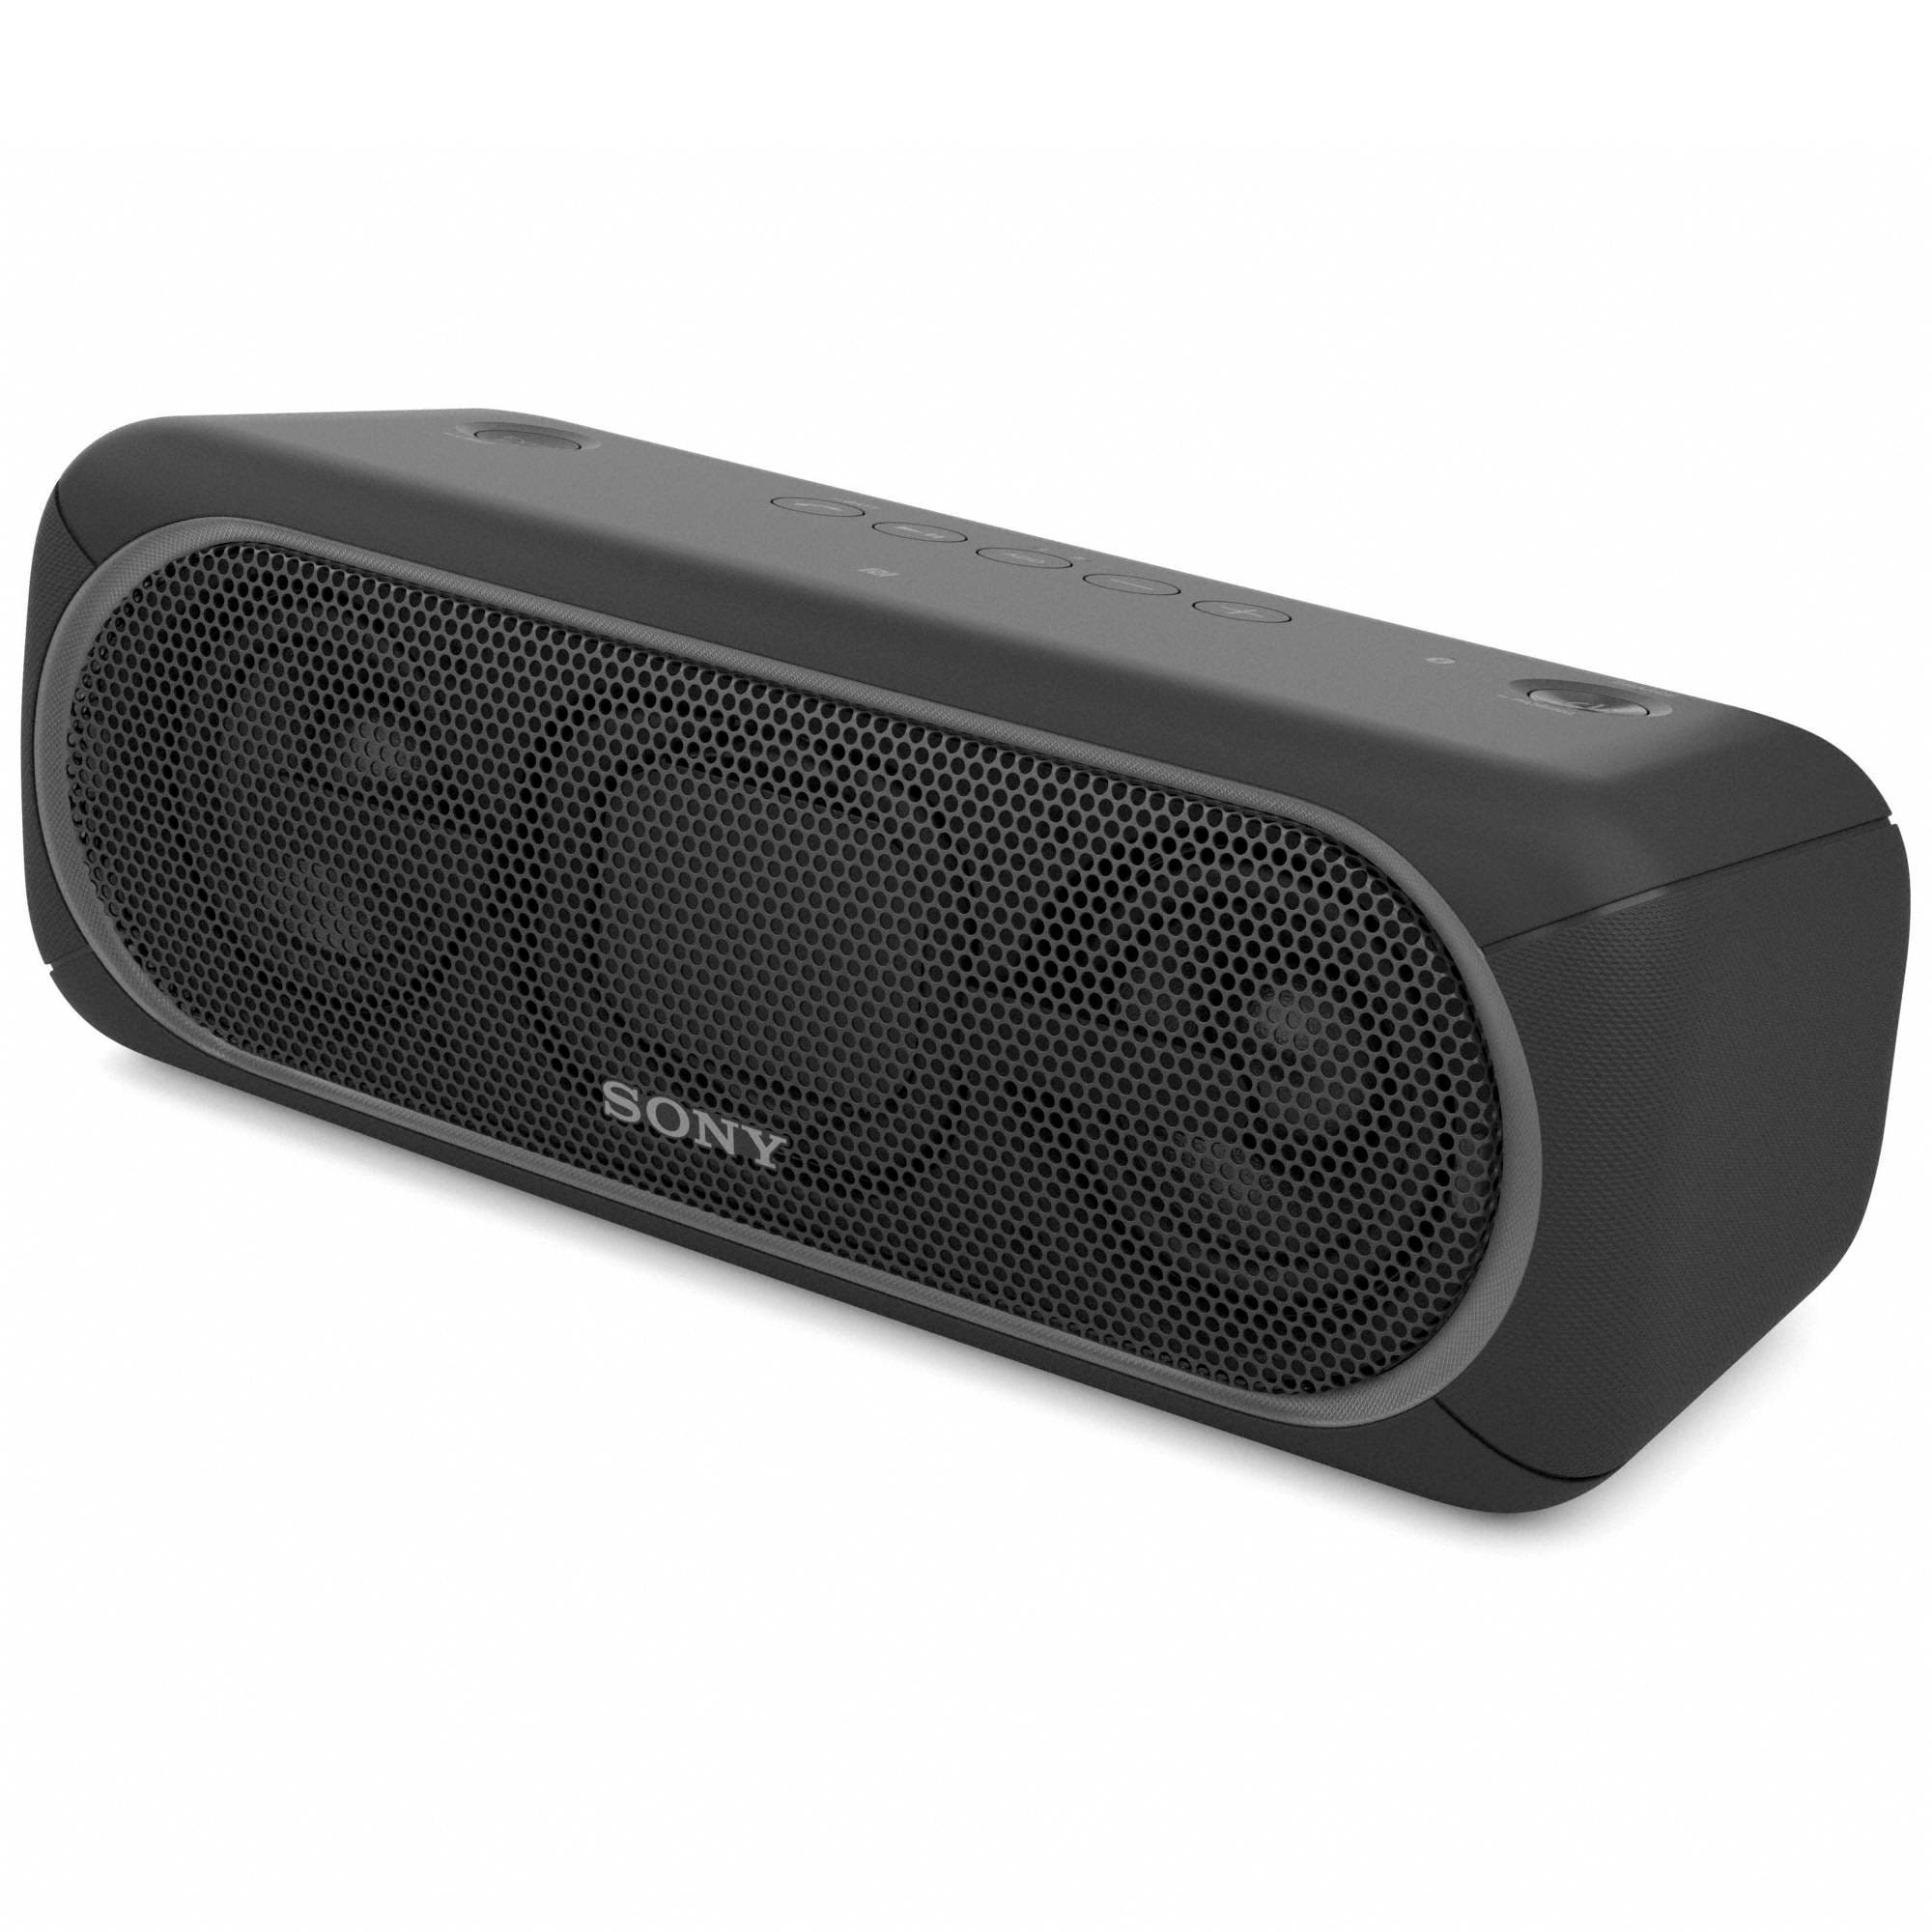 Sony SRS-XB40 - alla experttester samlade - Test.se aa67a45e67e4d